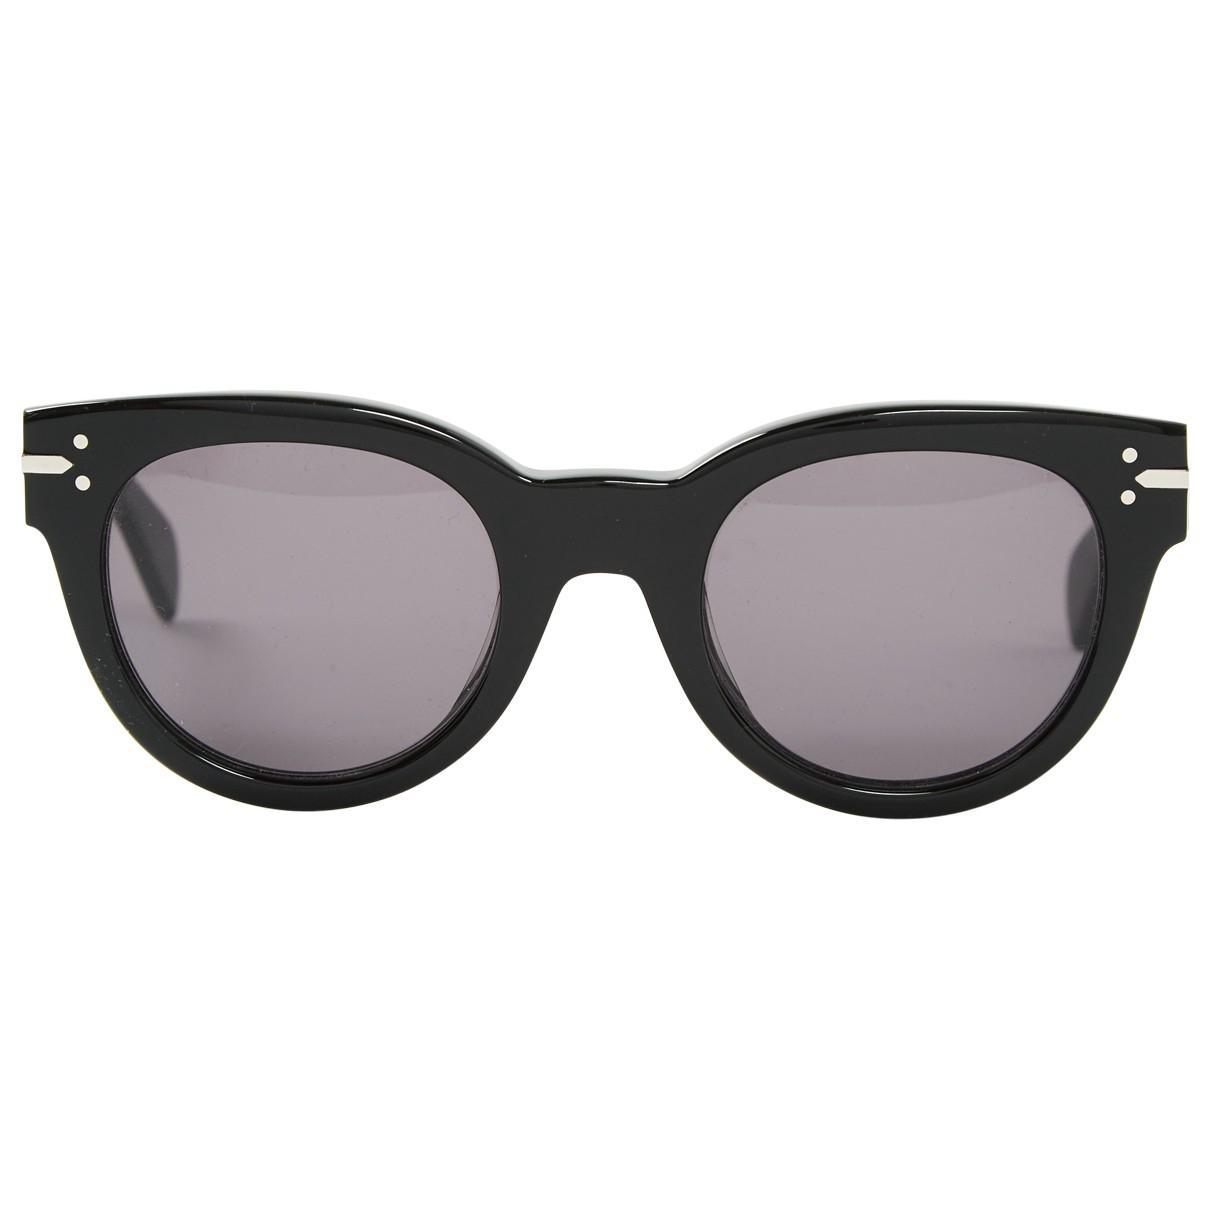 07524b08bebc Lyst - Céline Pre-owned Sunglasses in Black